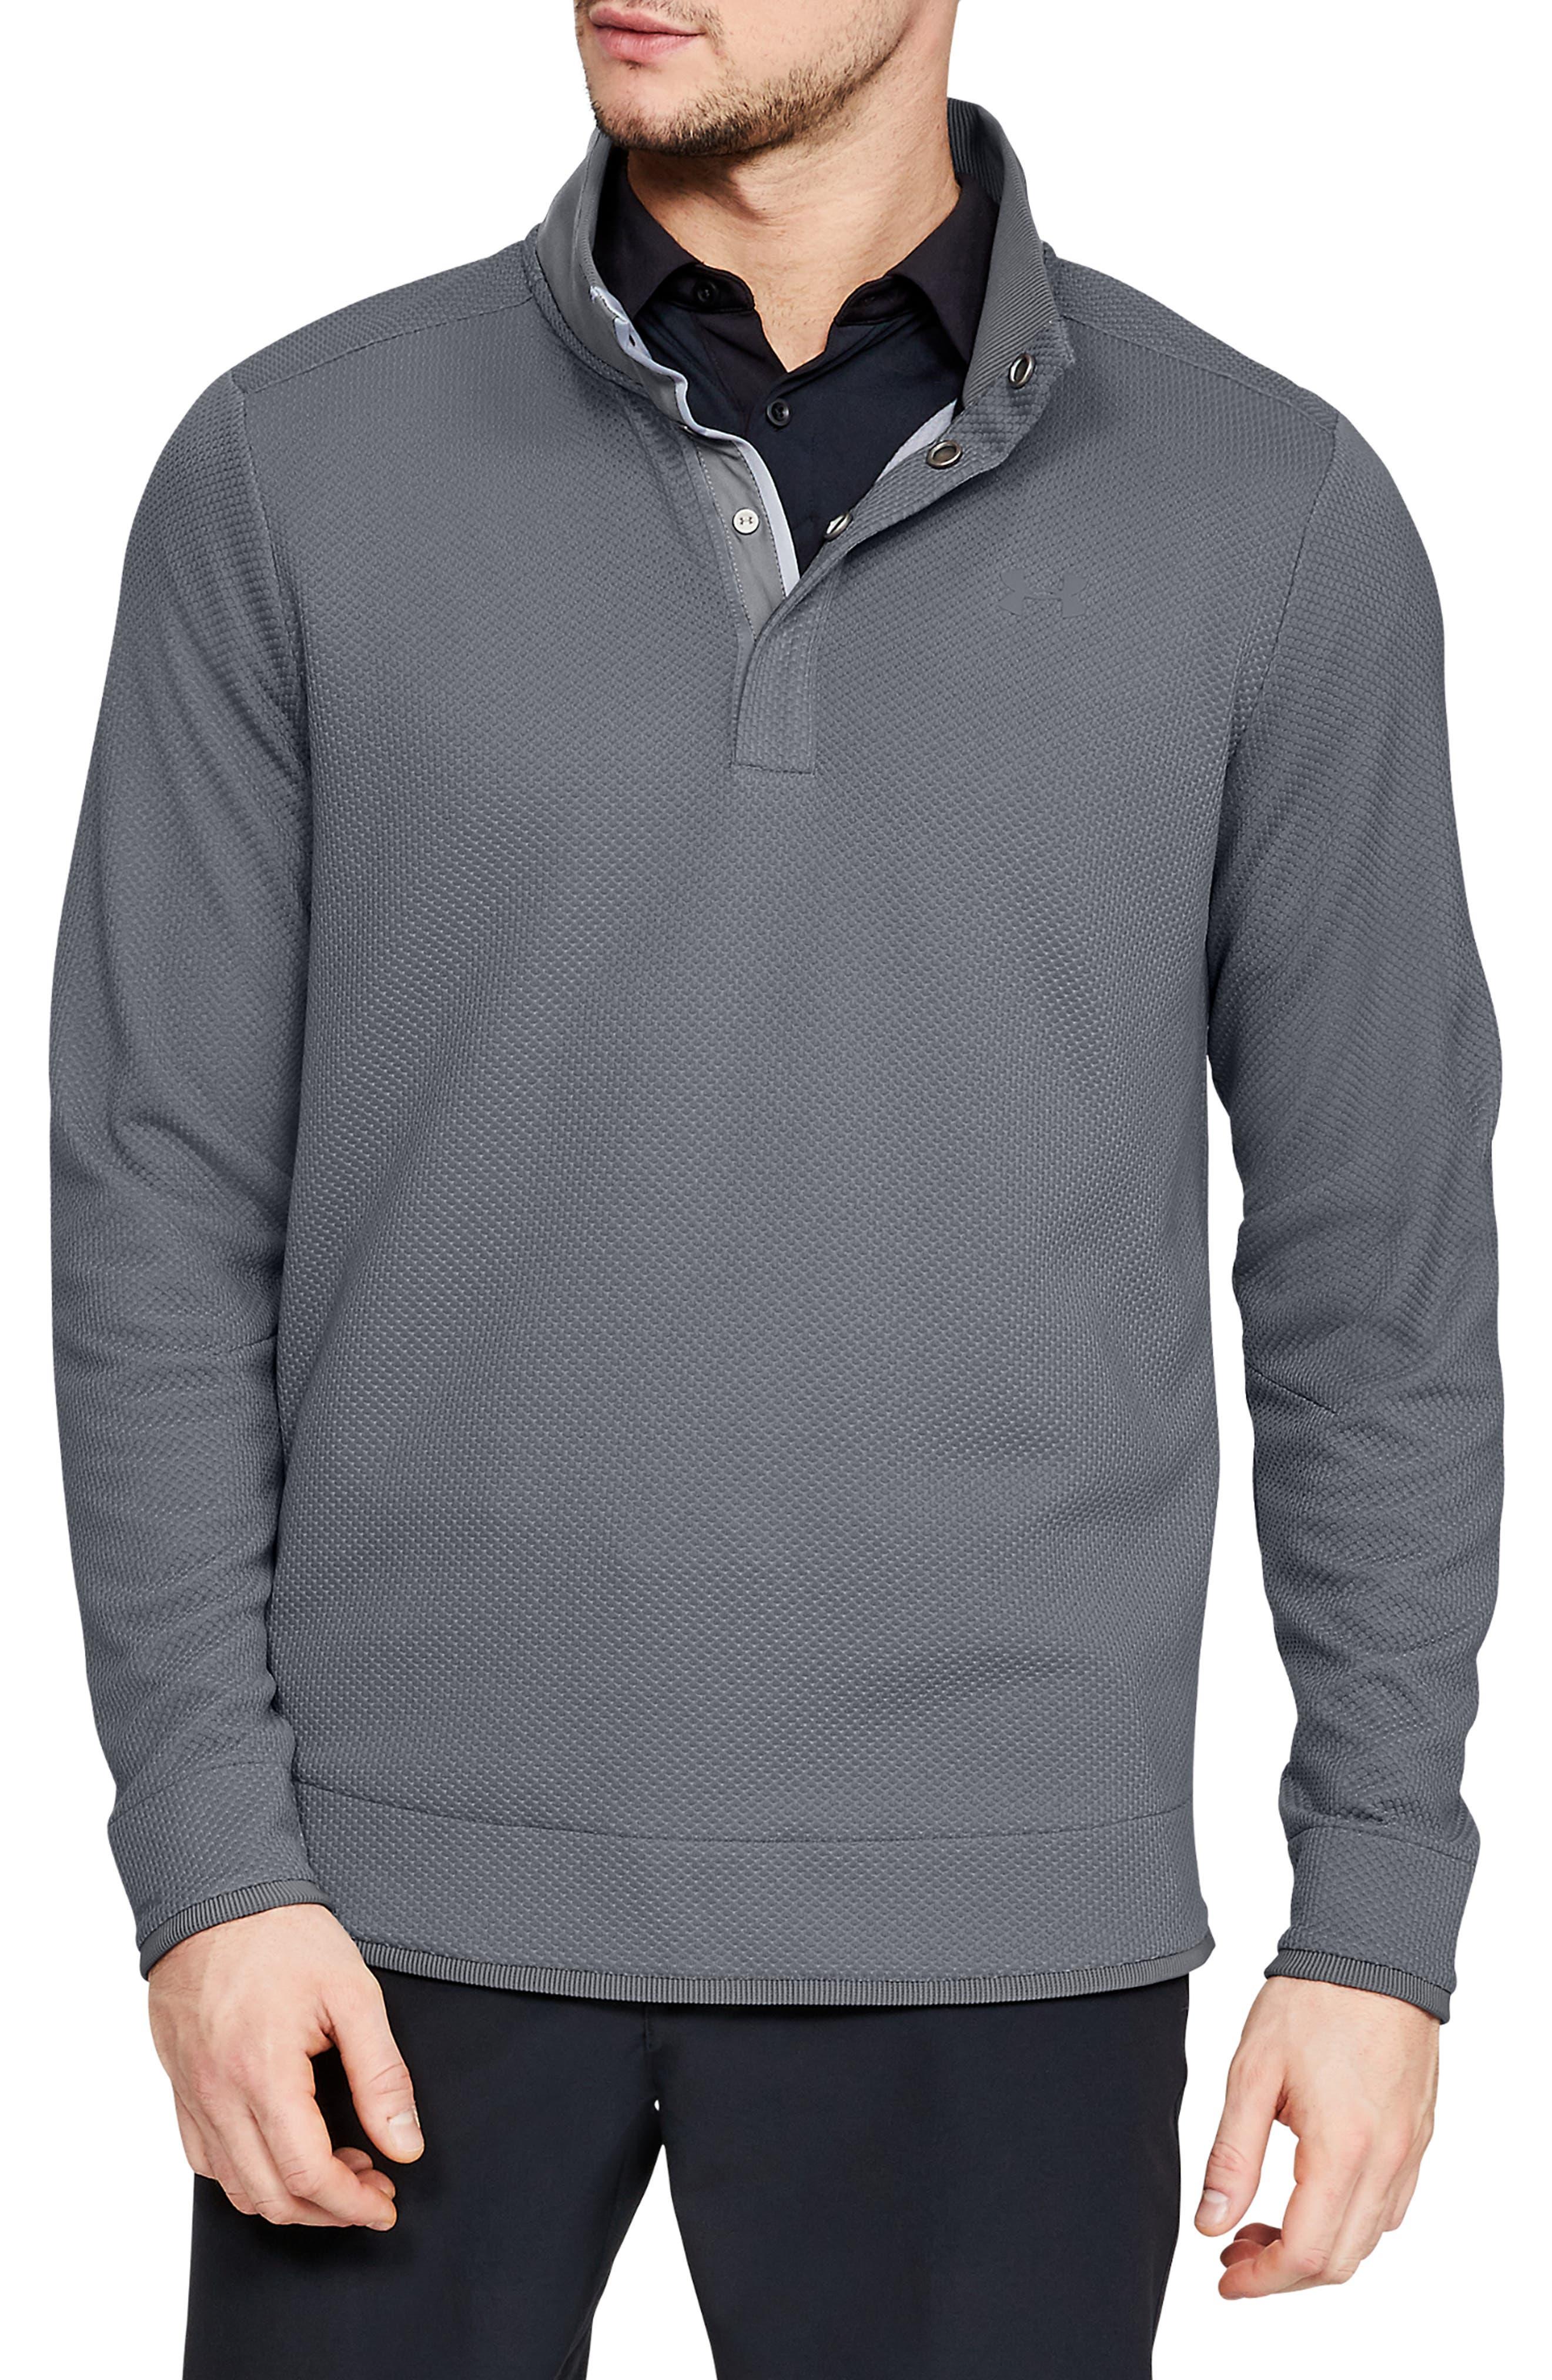 Under Armour Storm Sweaterfleece Snap Mock Neck Pullover, Grey